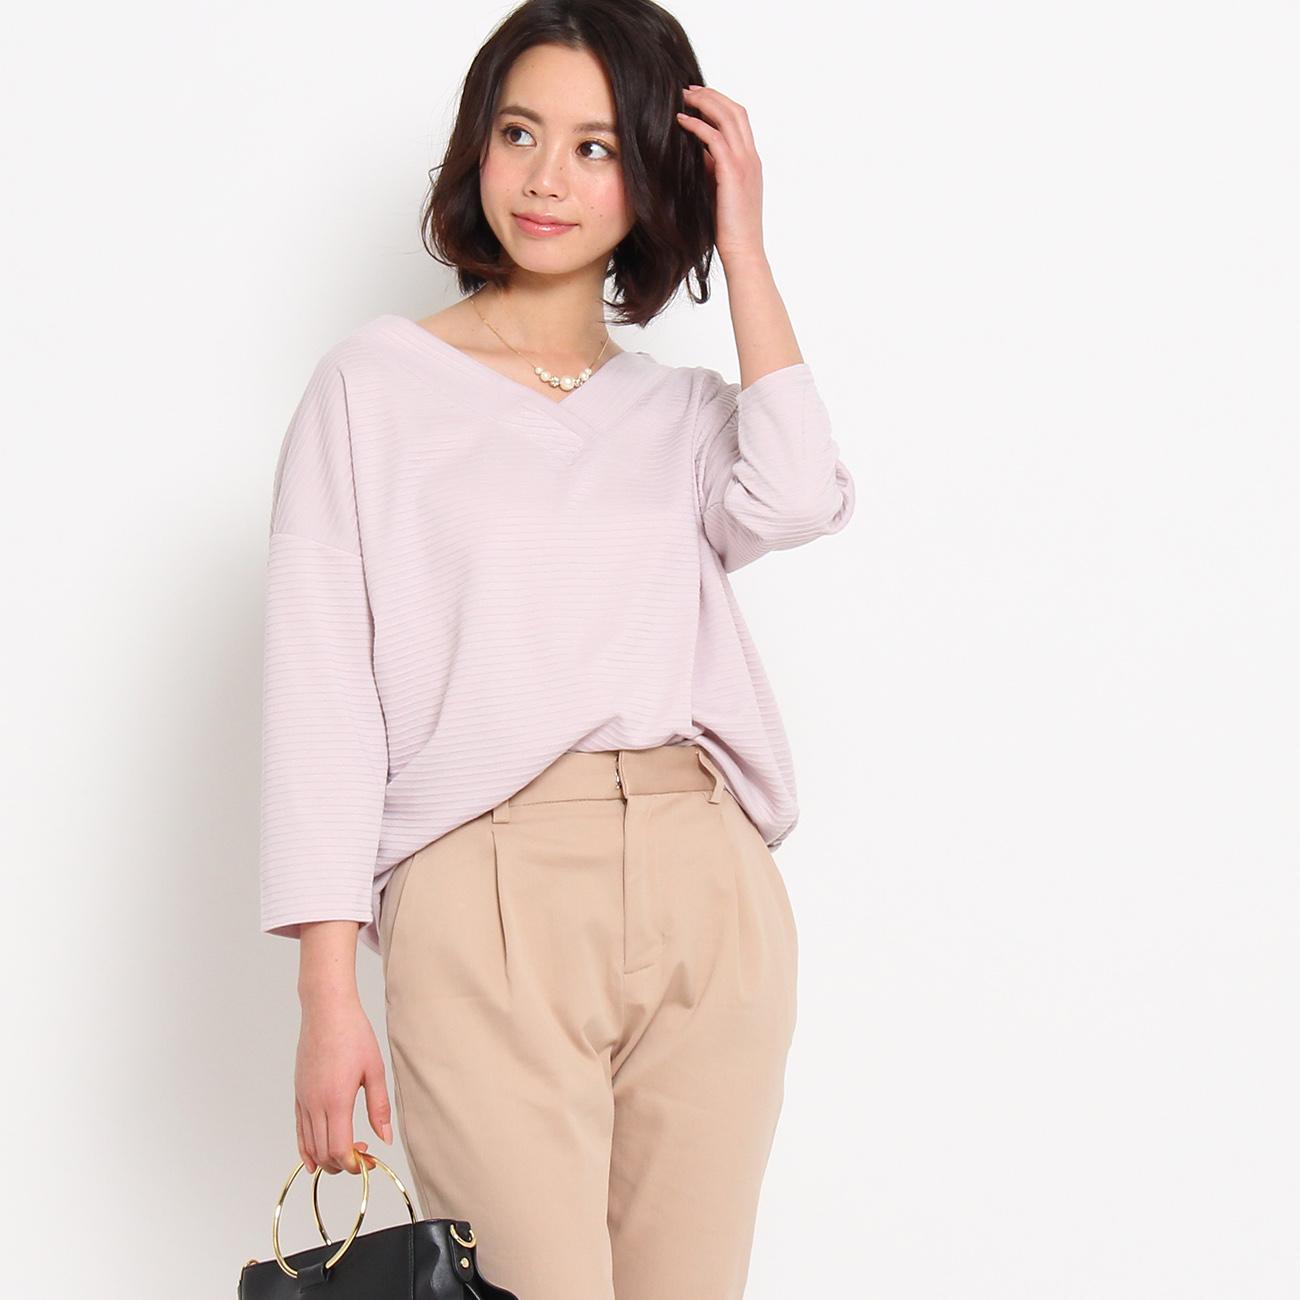 【Couture brooch (クチュールブローチ)】リップルボーダーカットソーレディース トップス カットソー・Tシャツ ピンク系